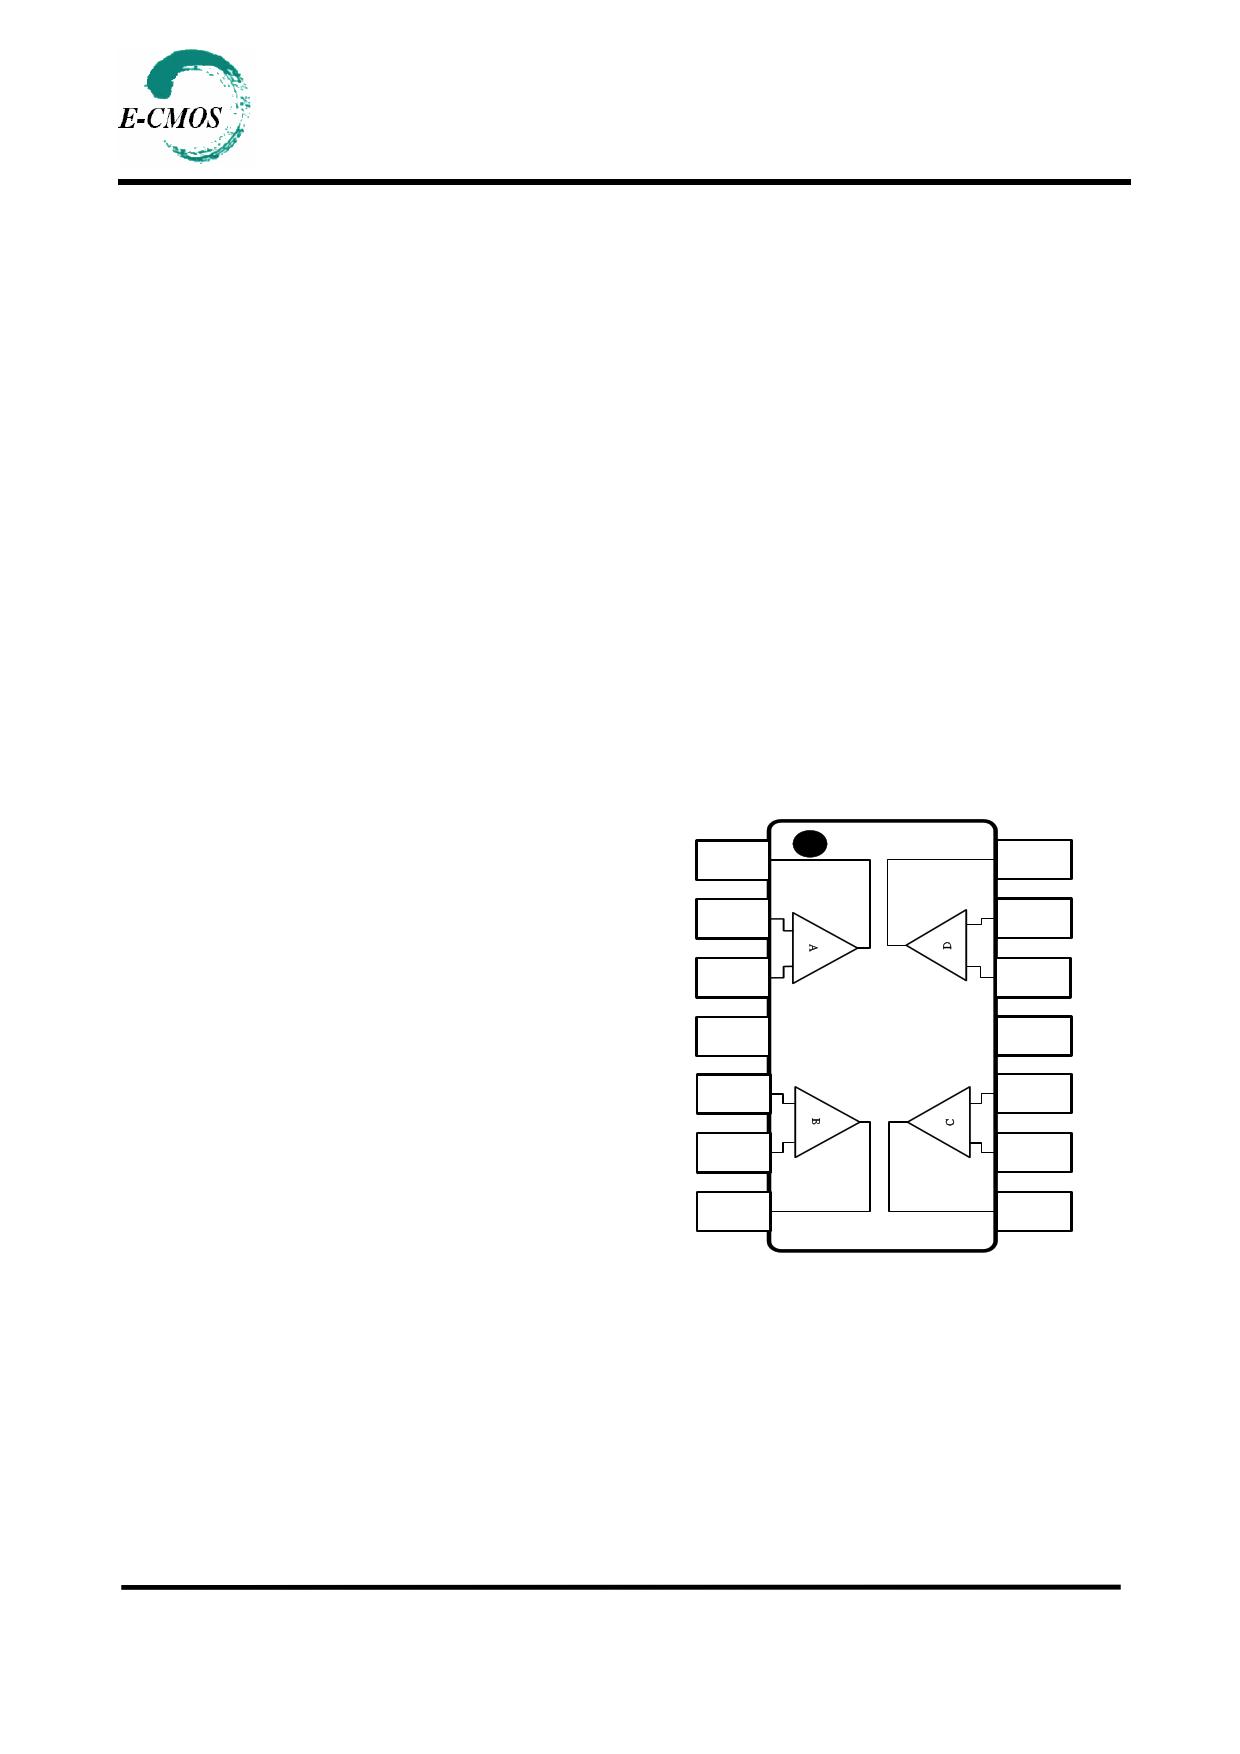 EC5420 دیتاشیت PDF